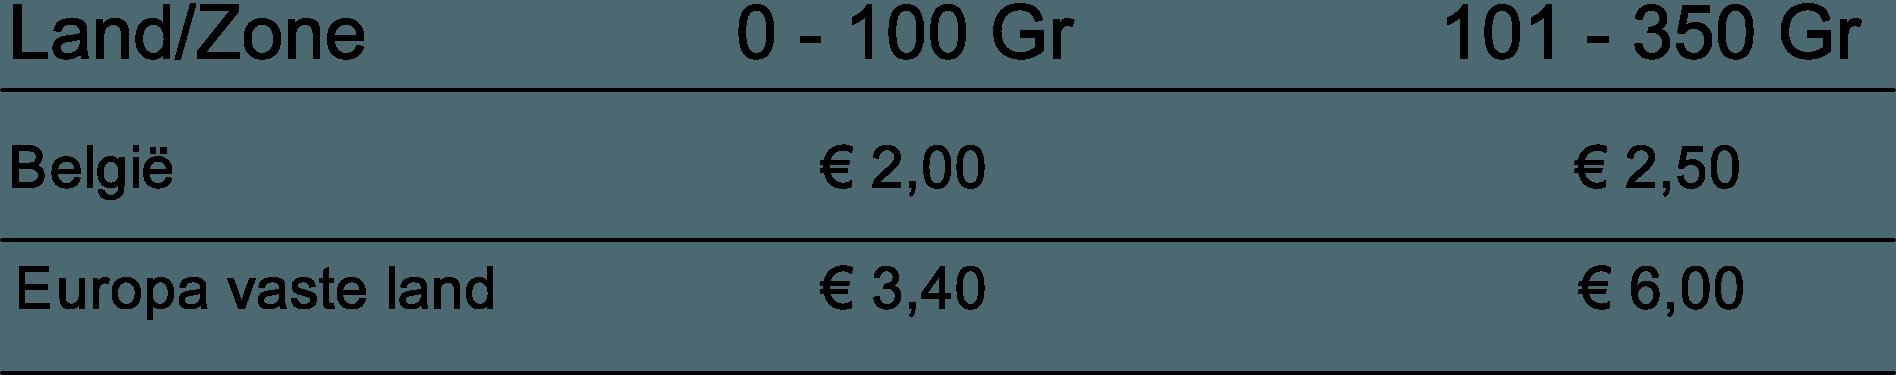 Tarieven - Zonder track & trace